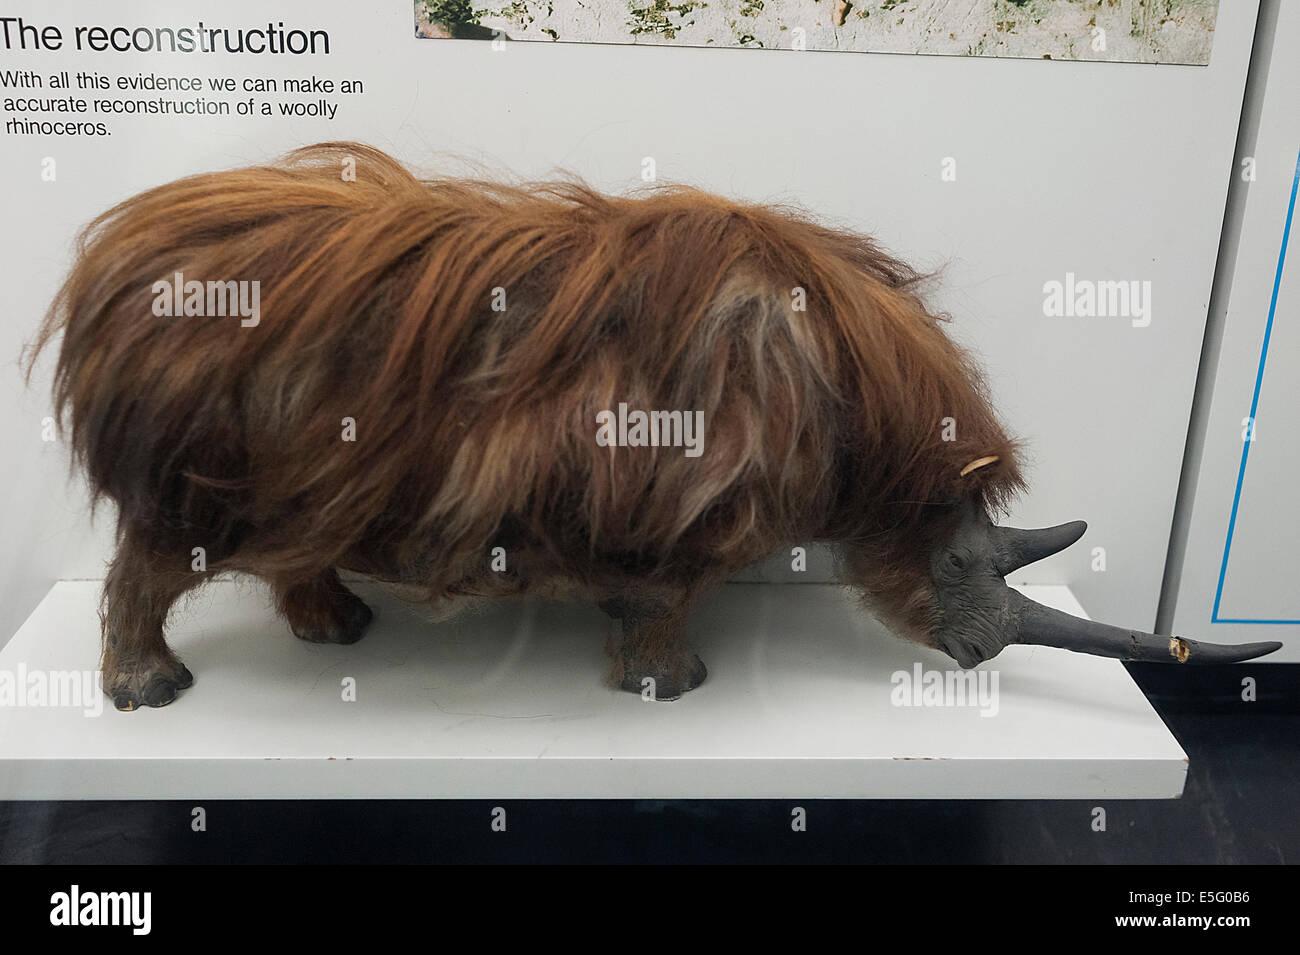 Recostruction of wolly rhinoceros Coelodonta antiquitatis, Pleistocene - Stock Image